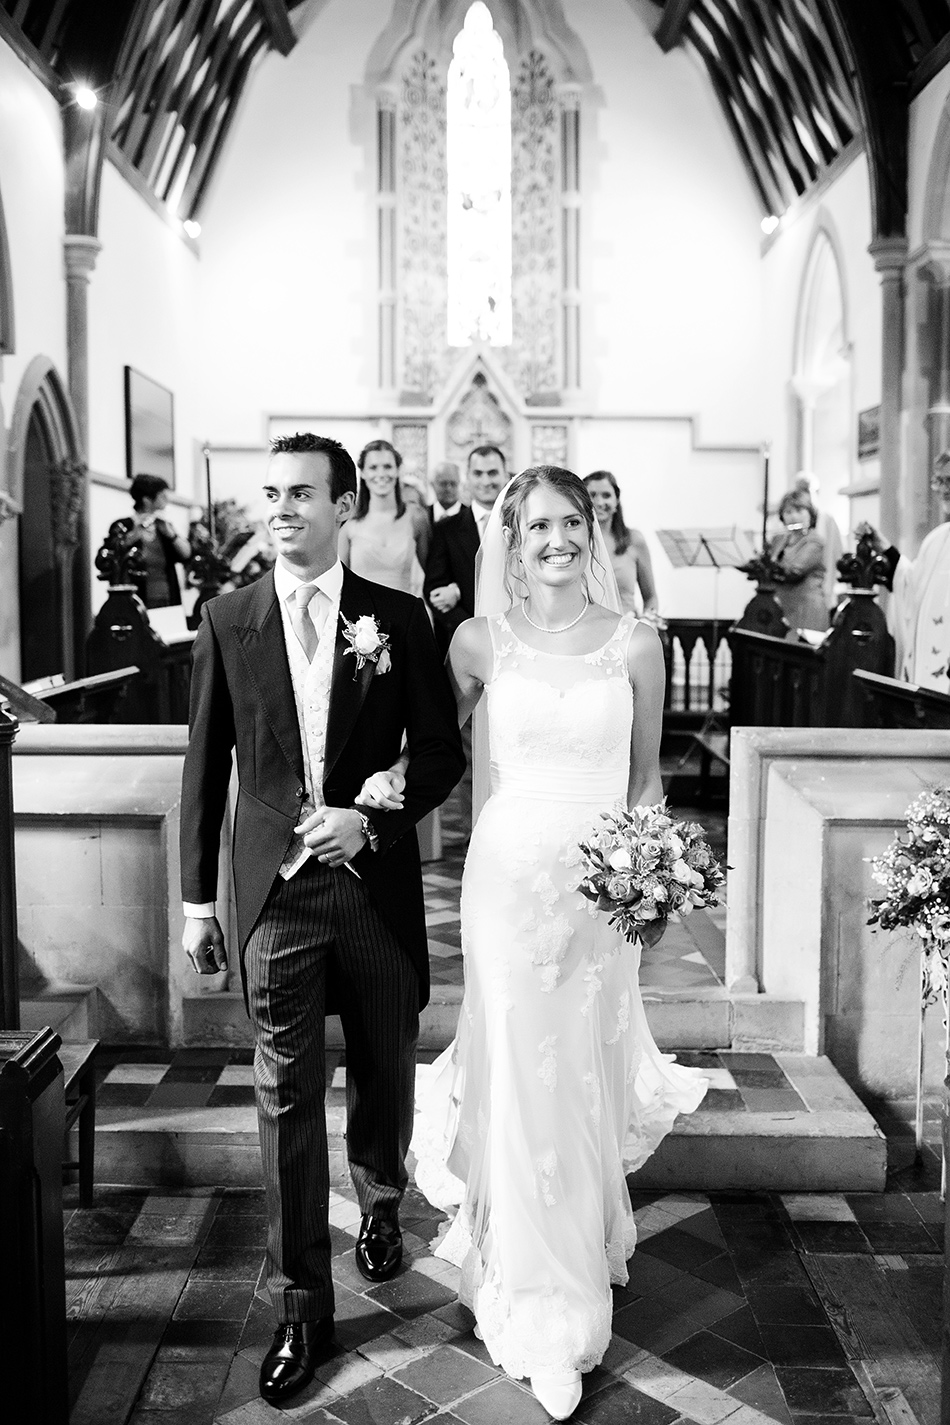 brisbane wedding photographer leaving church